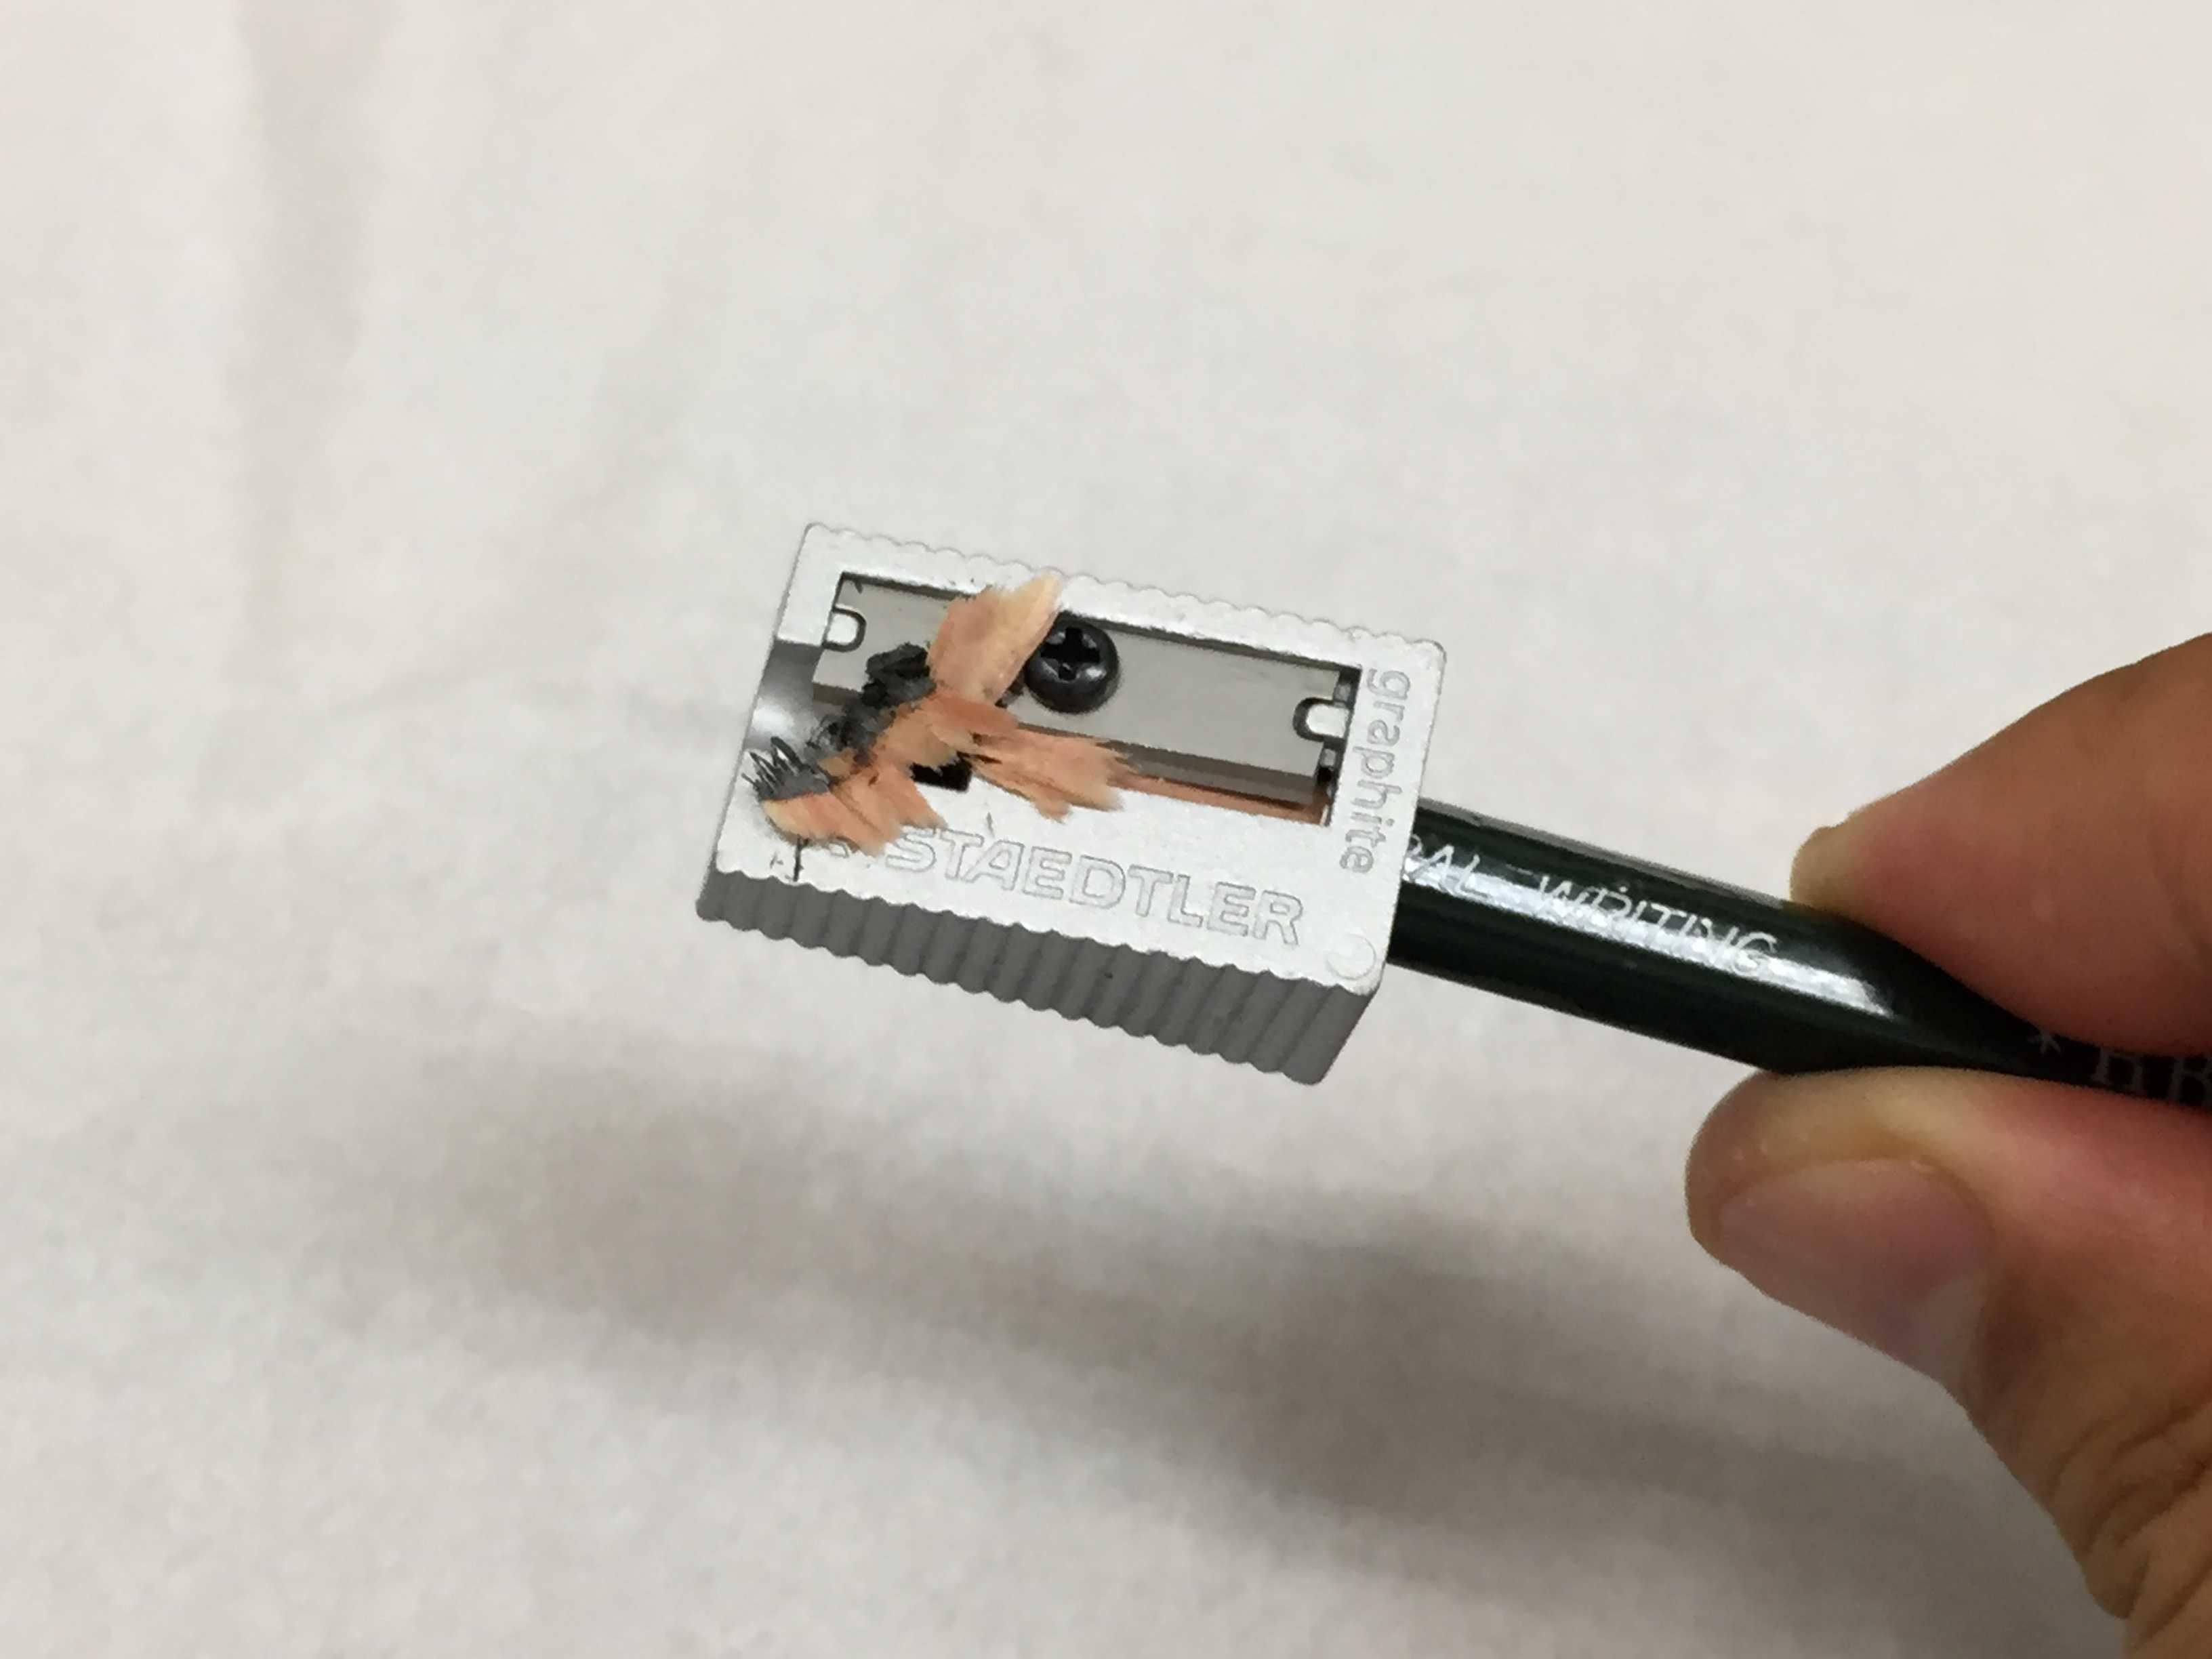 鉛筆の削りかす